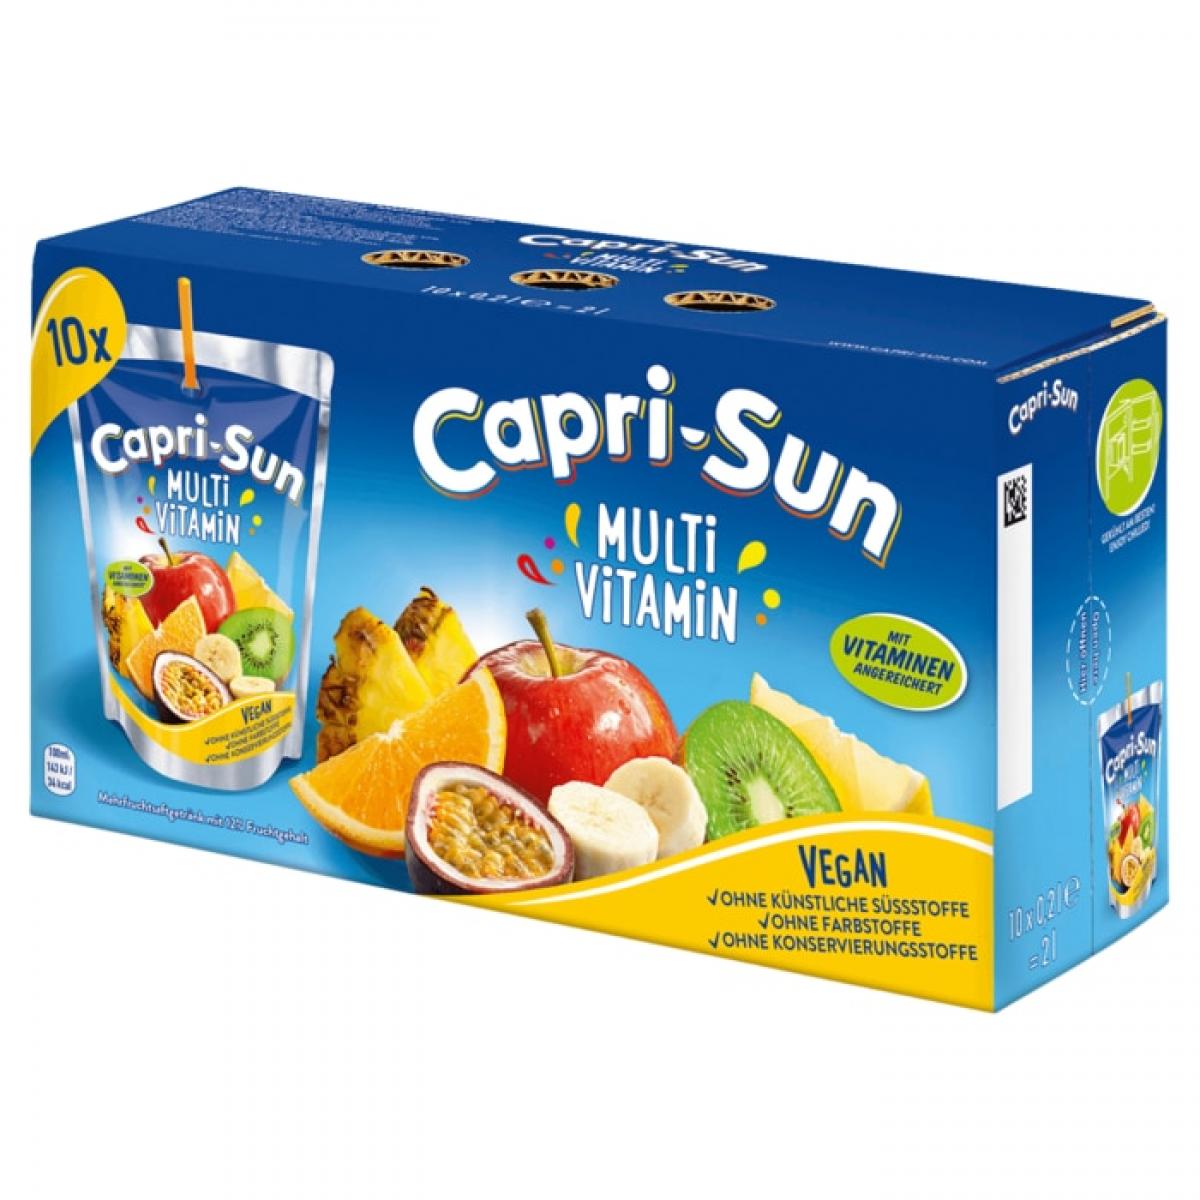 Capri MULTI 10x0,2L